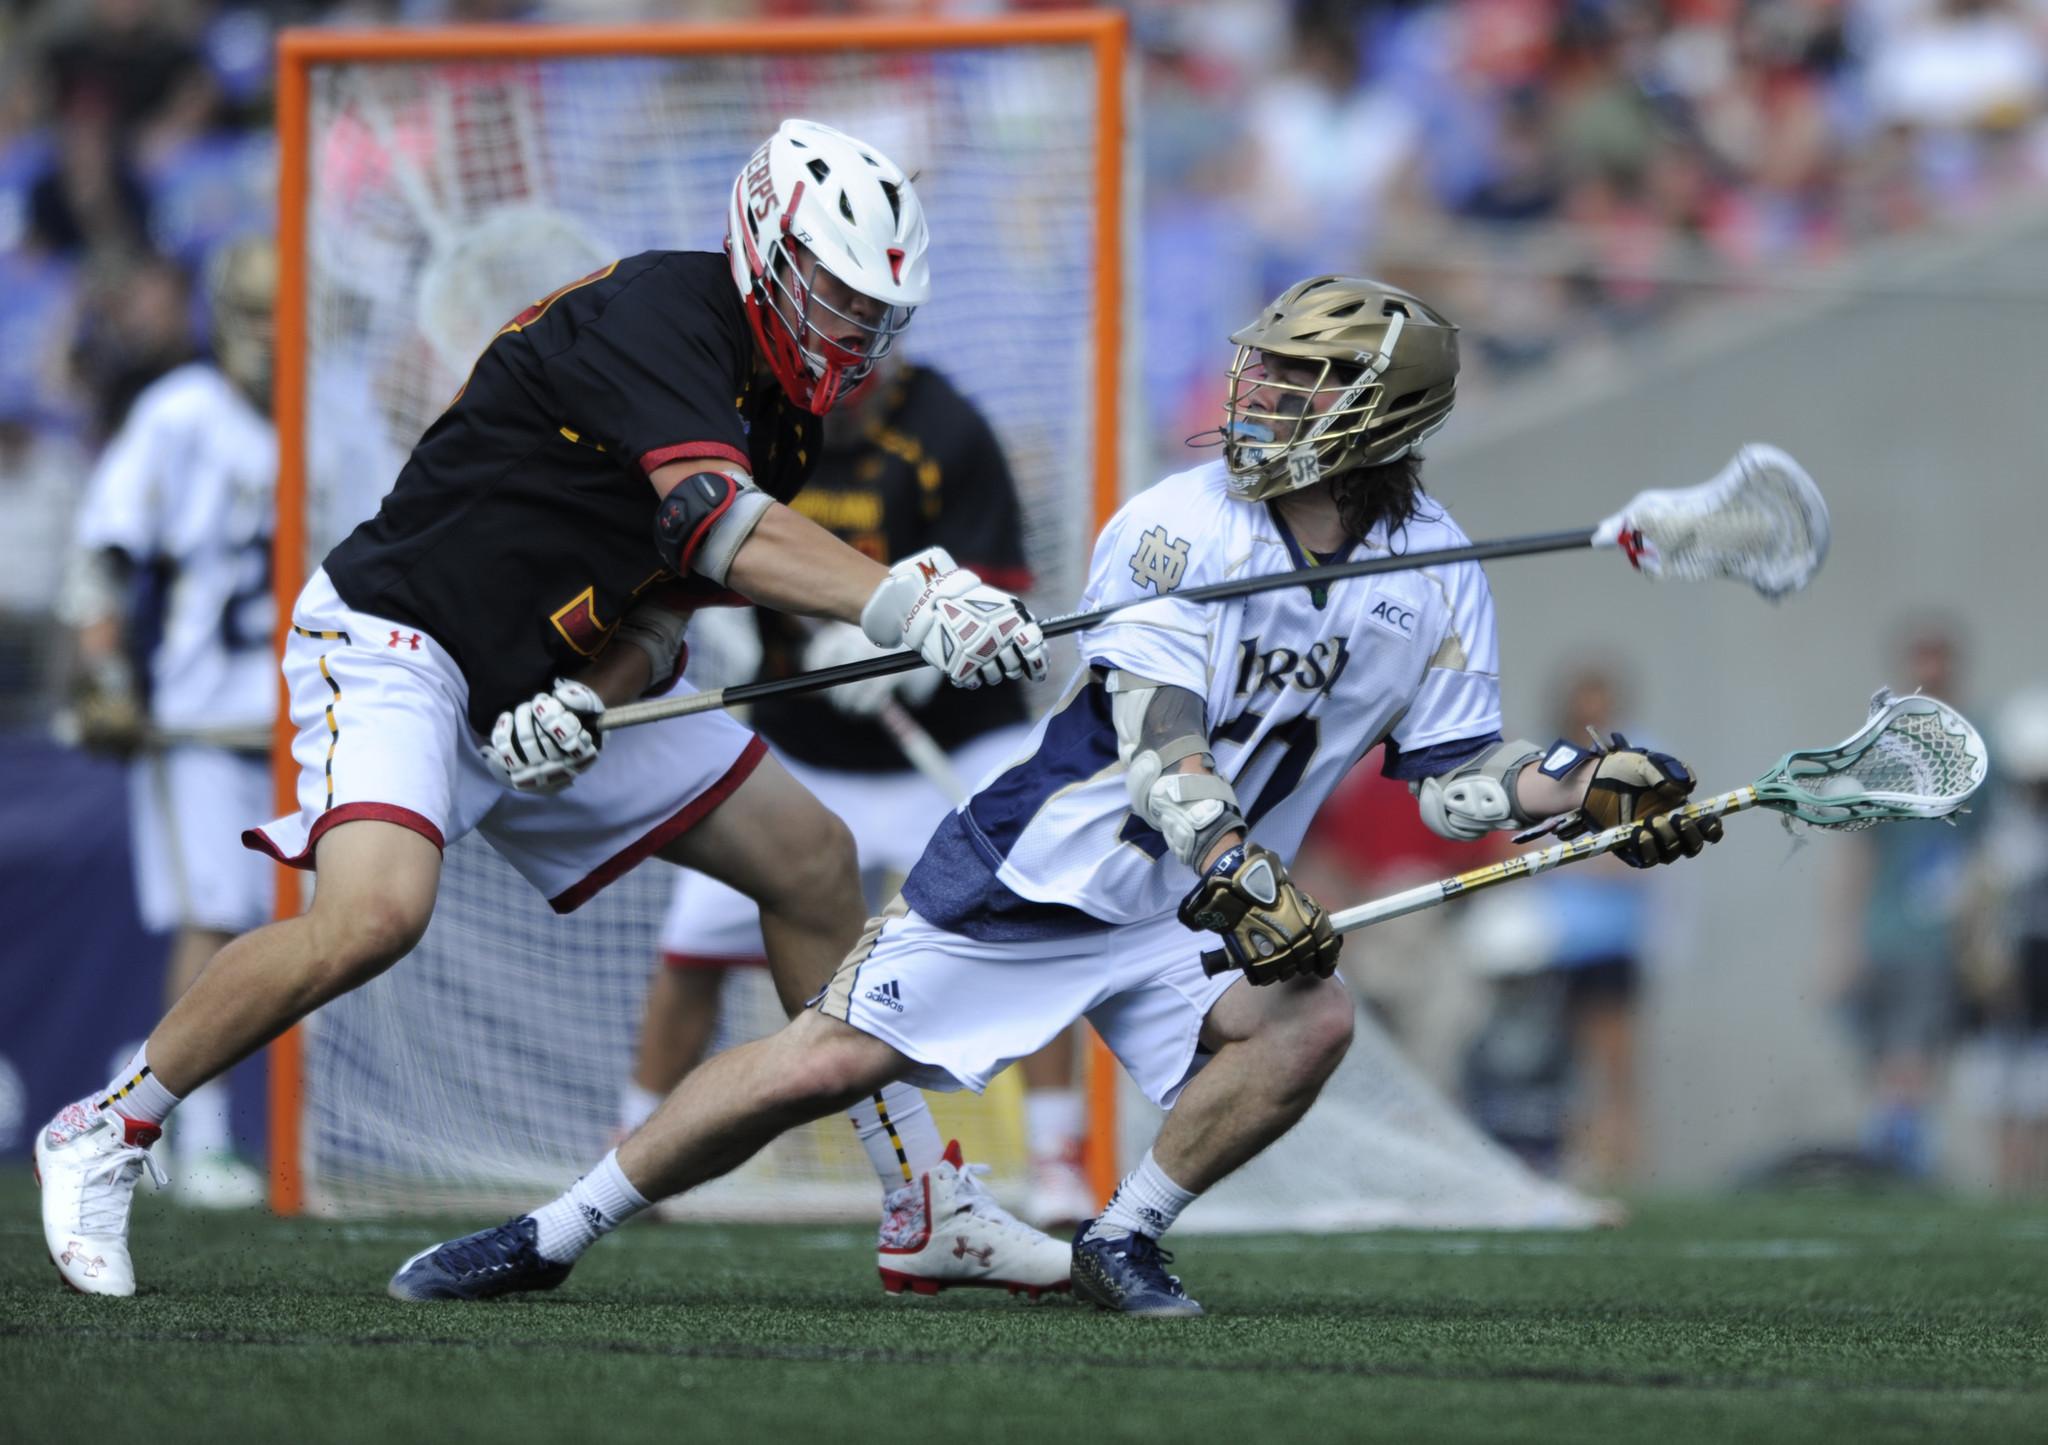 High Point Lacrosse >> Maryland men's lacrosse could really benefit from defenseman Matt Dunn's return - Baltimore Sun